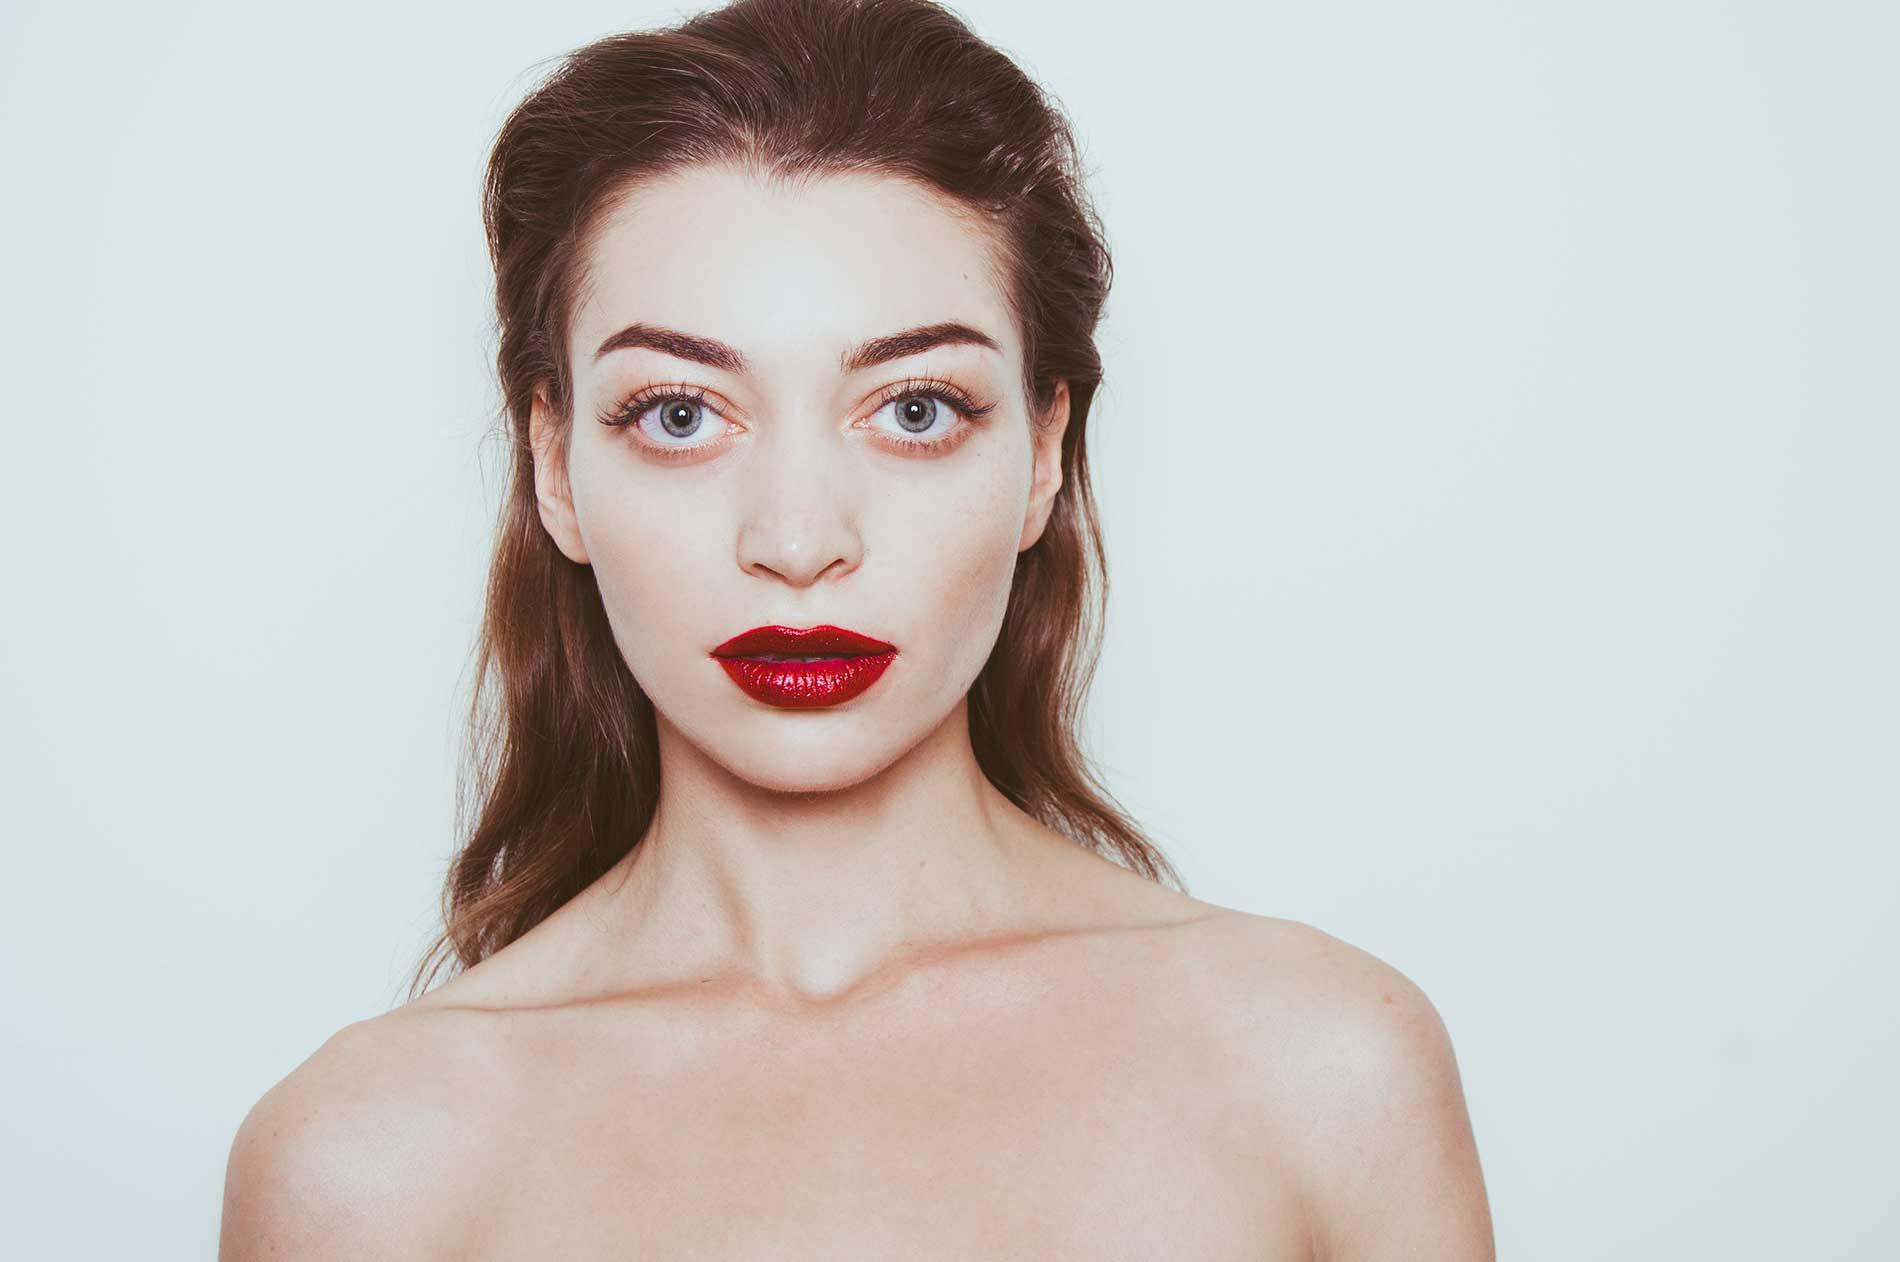 alicia-oliveri-professional-make-up-artist-new-york-city-holiday-campaign.jpg